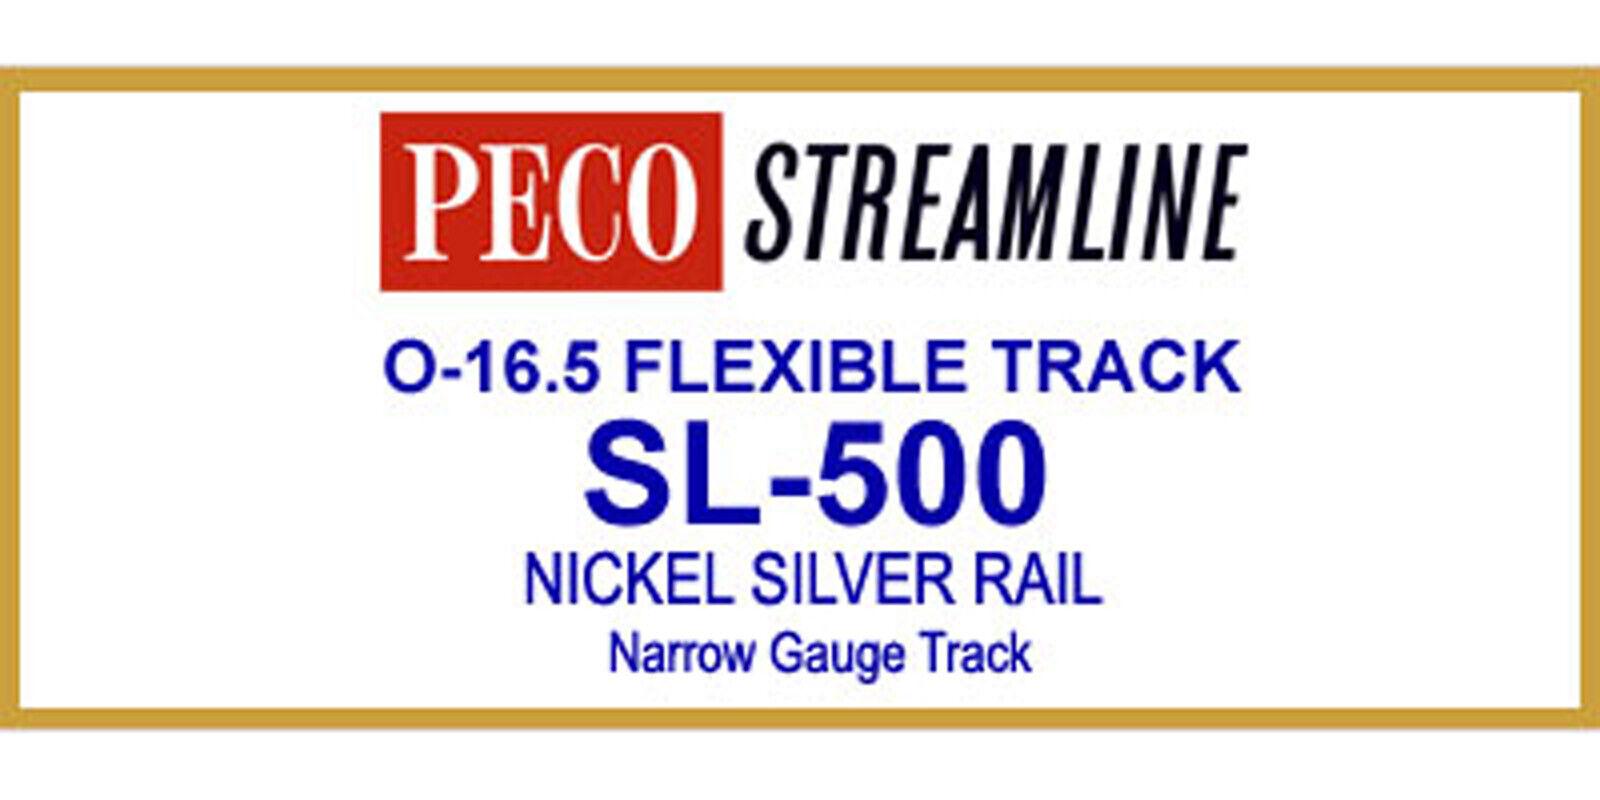 tienda en linea Peco On30 On30 On30 código de plata de níquel 100 36  pista Flex (12PC BOX) SL500 modelo del ferroCocheril  nueva gama alta exclusiva